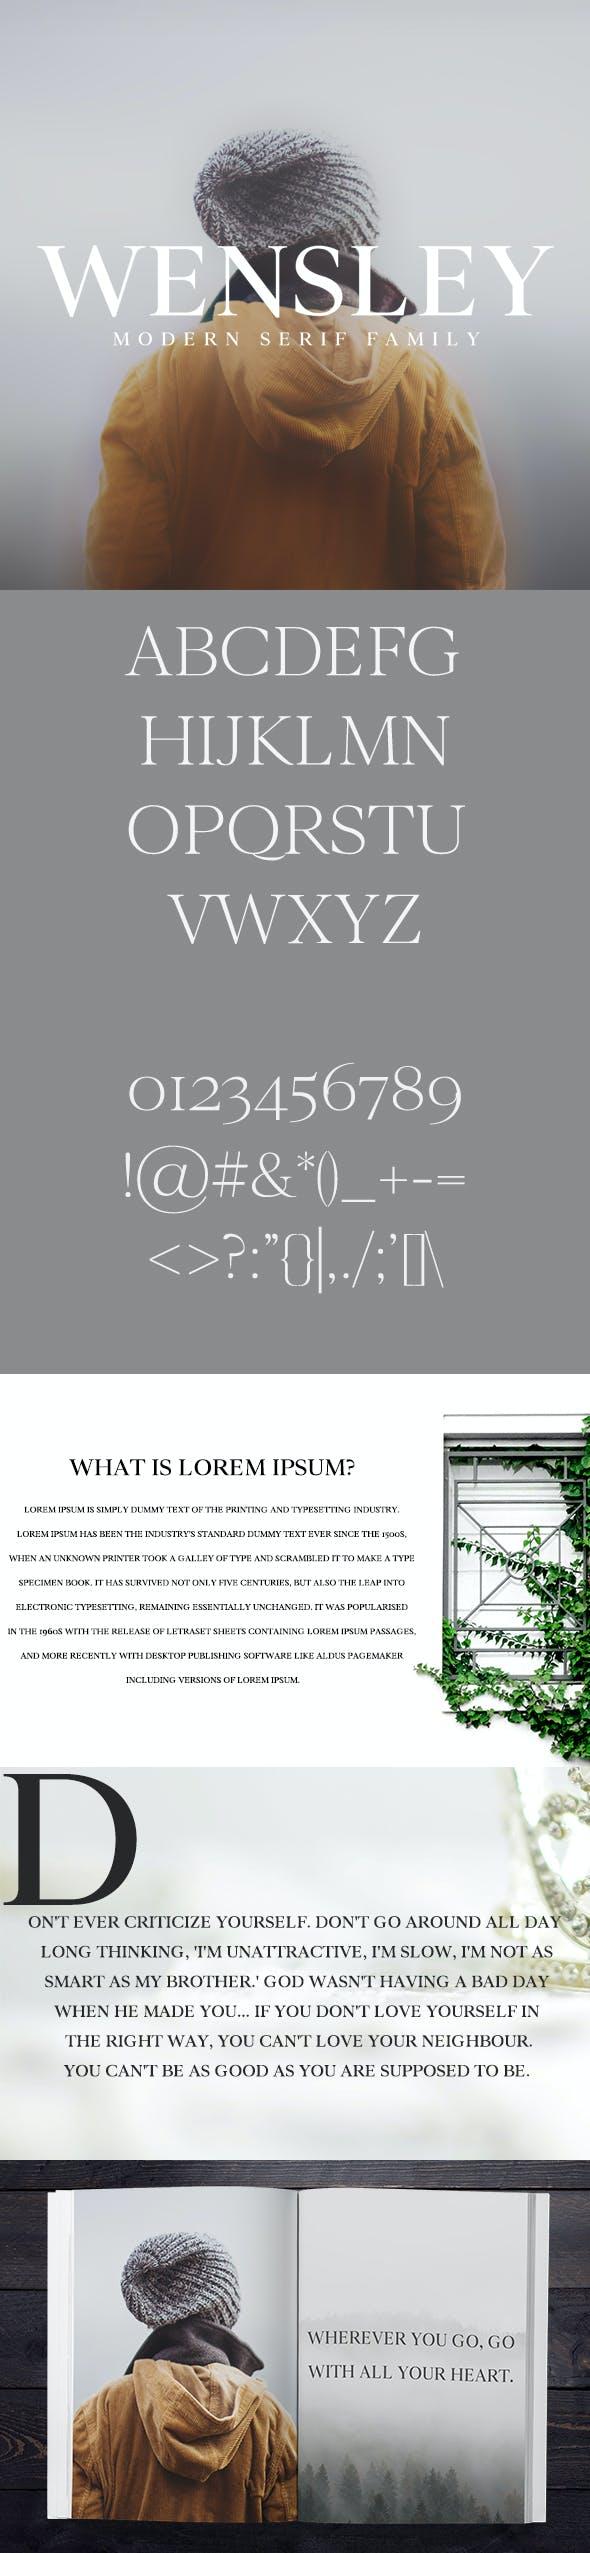 Wensley Modern Serif Font Family